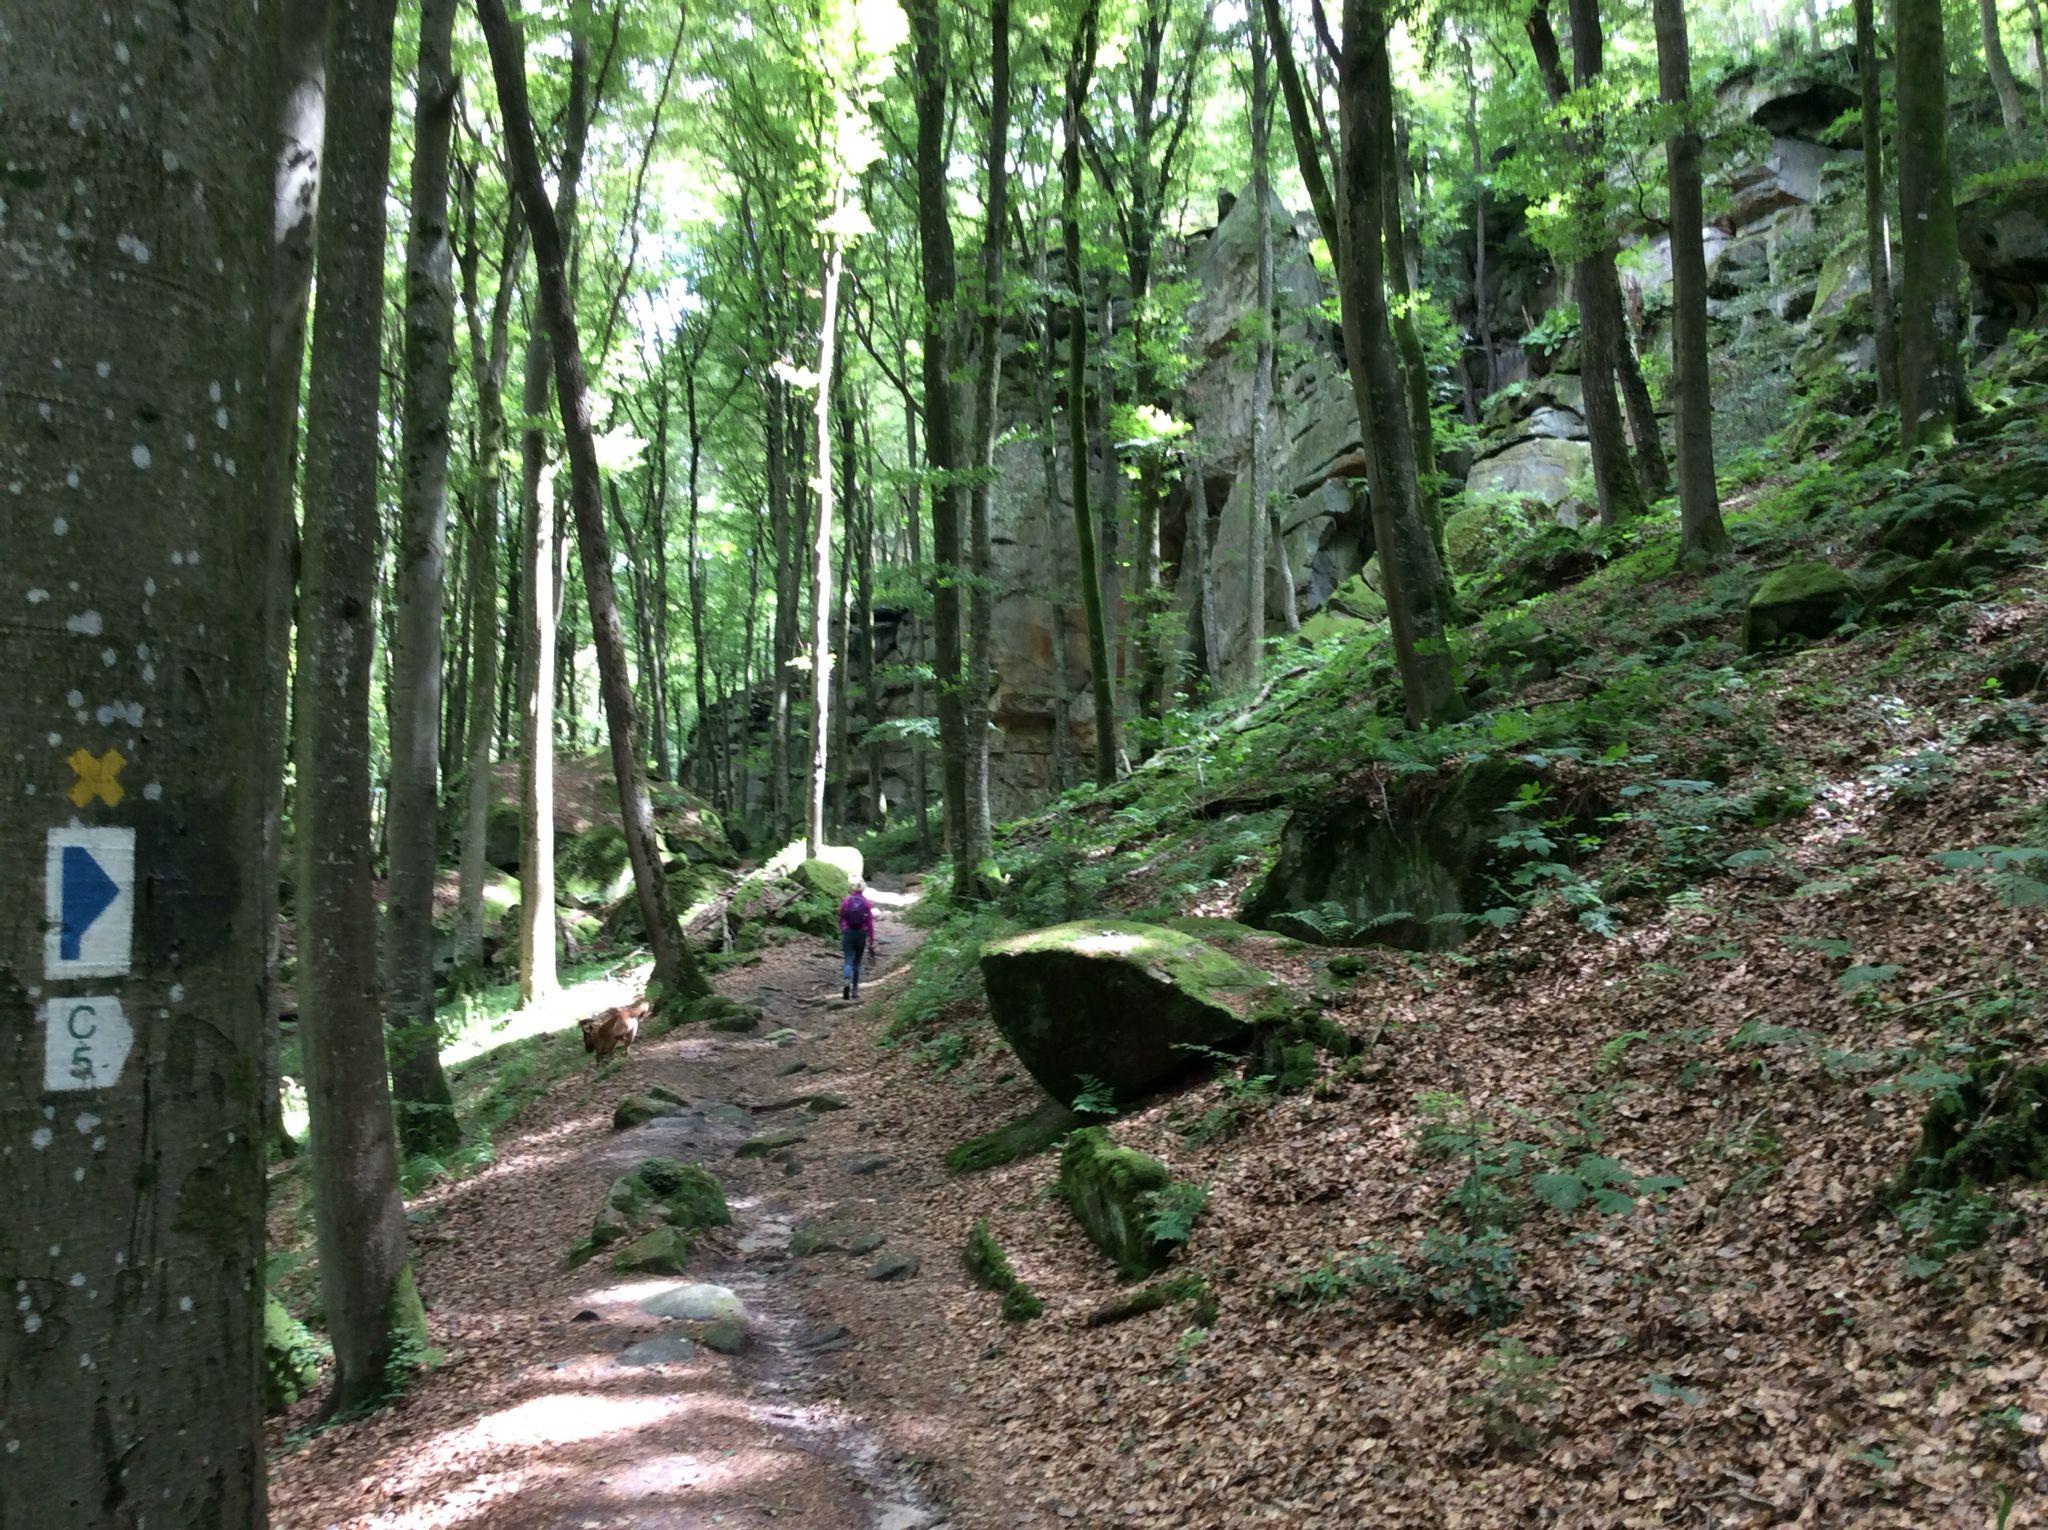 Fresh air oxygen  earth nature rocks green  feel free